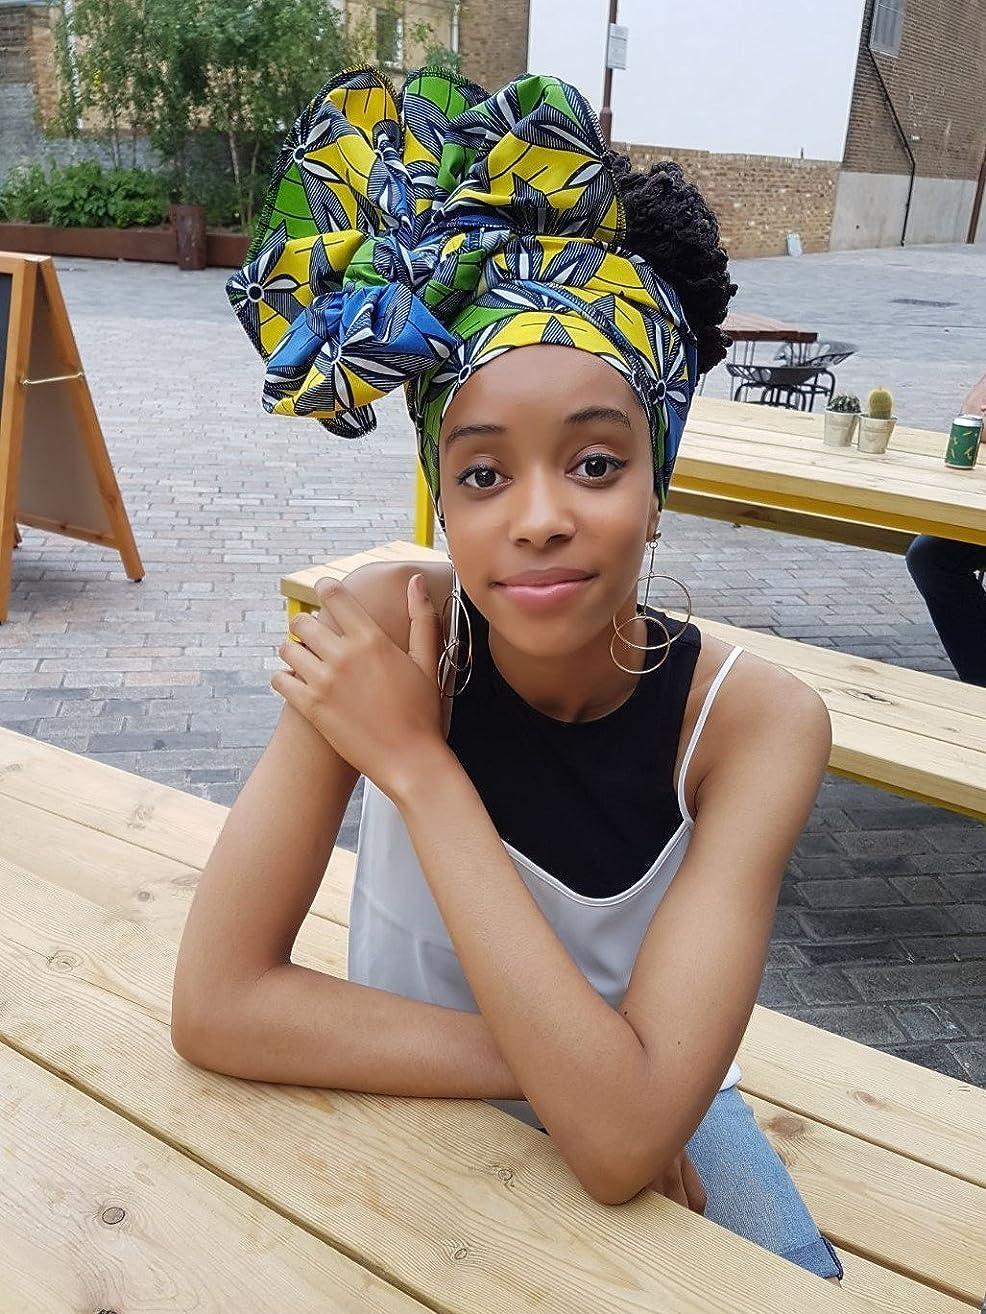 Headwrap / african print headwrap/ turban / Headtie / ankara headscarf / African headtie / wax print headwrap / headscarf - blue and yellow